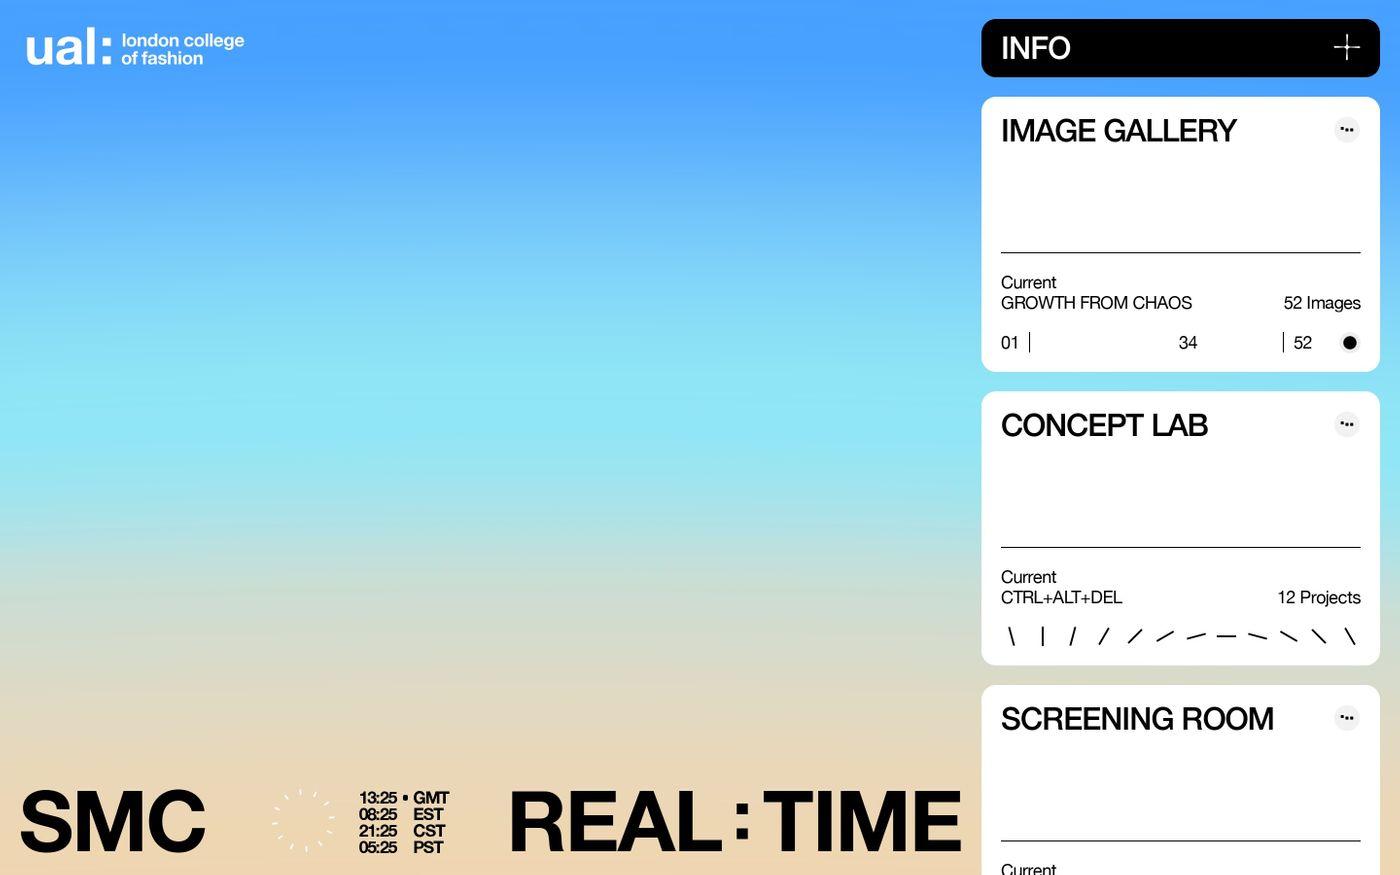 Screenshot of SMC Real-time website